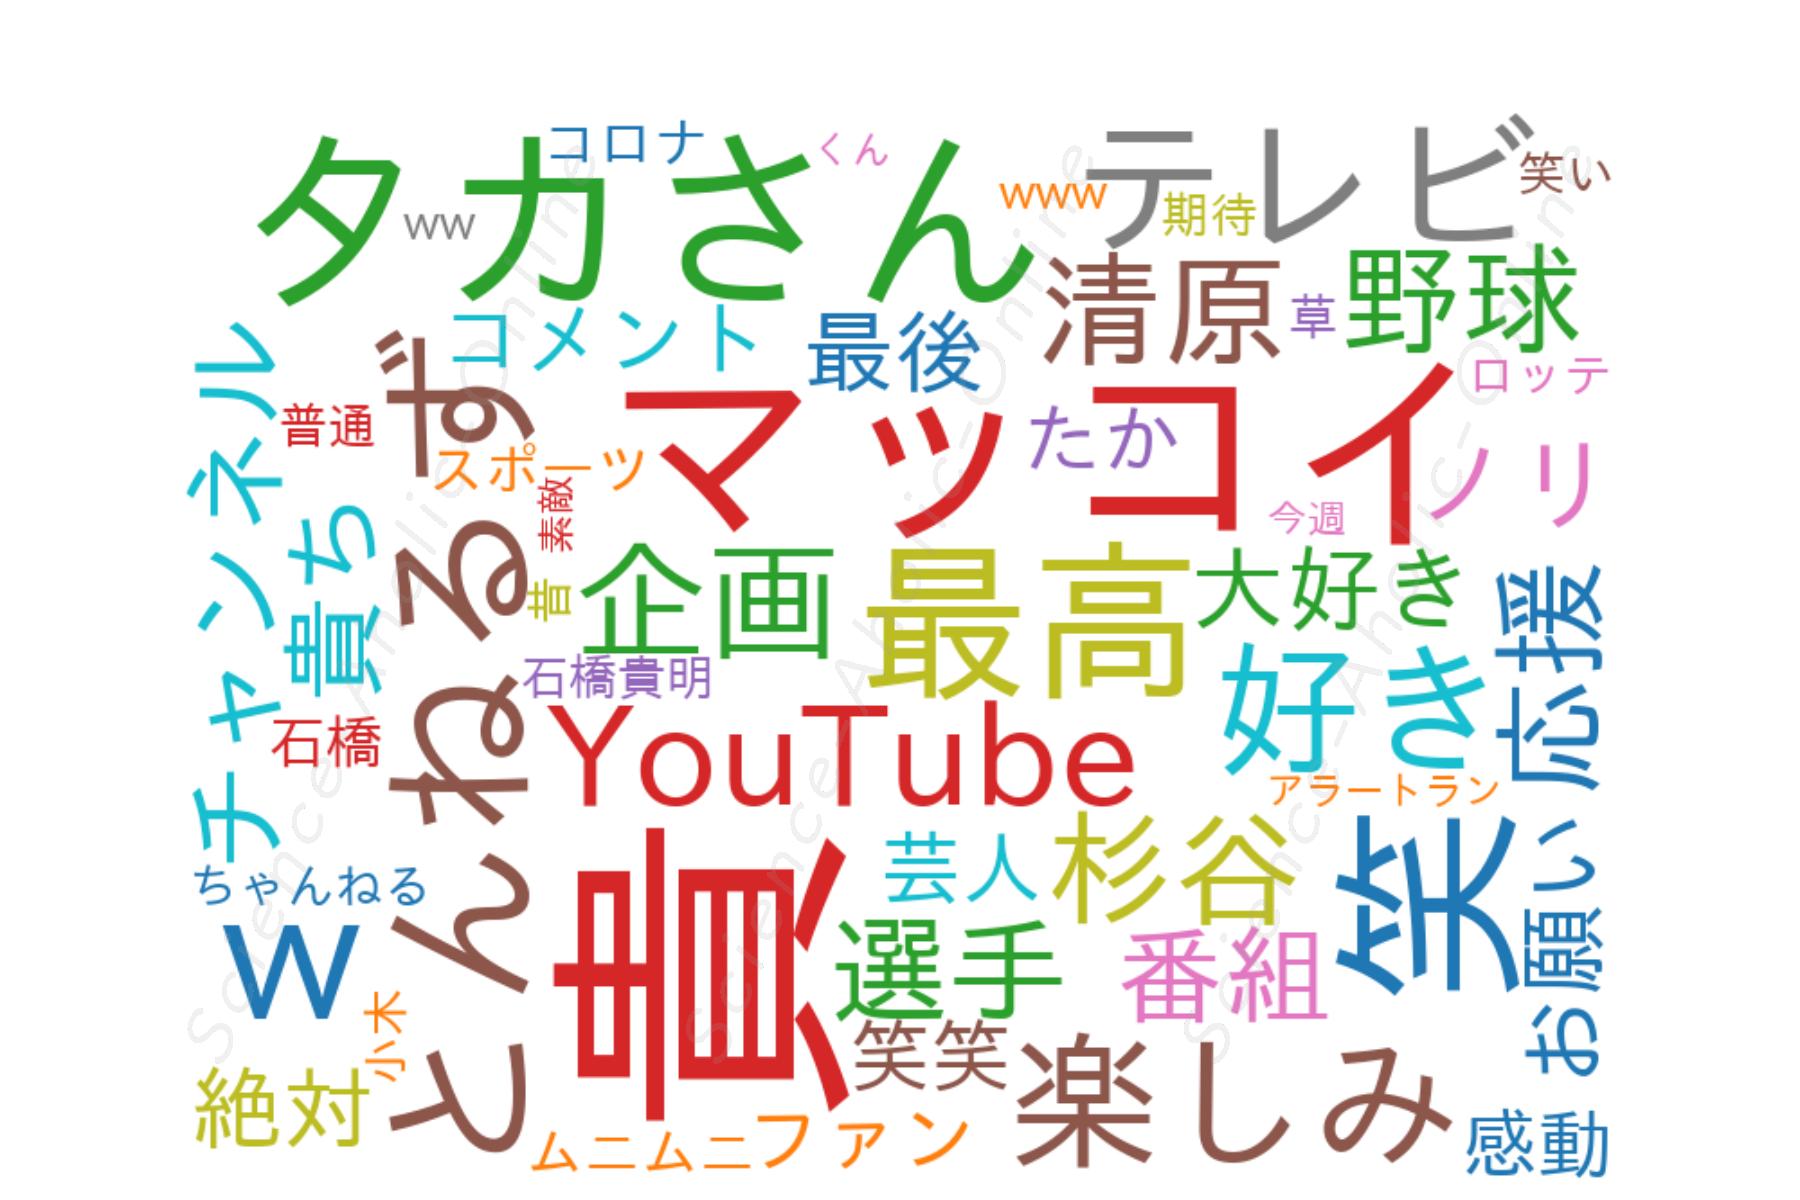 wordcloud_貴ちゃんねるず